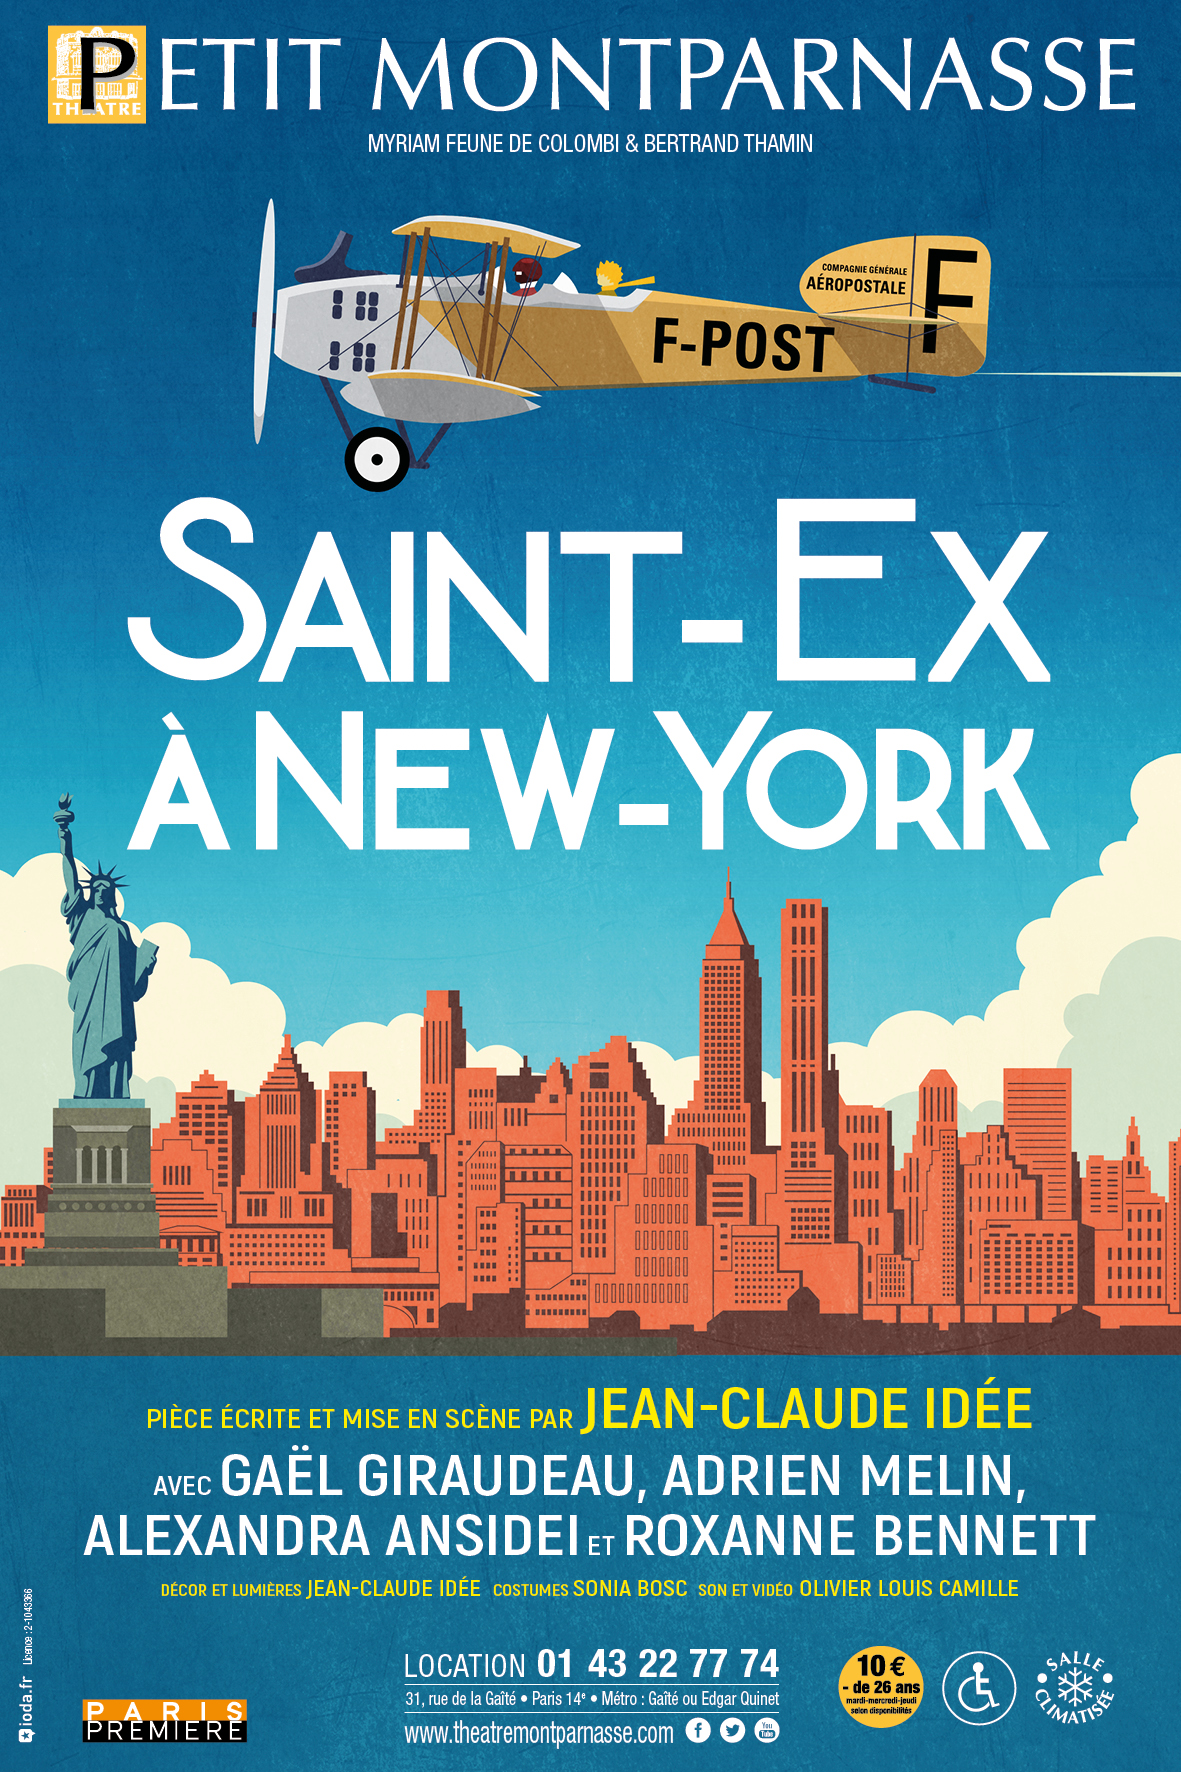 40x60 SAINT-EX À NEW-YORK v5A sans logo TPA